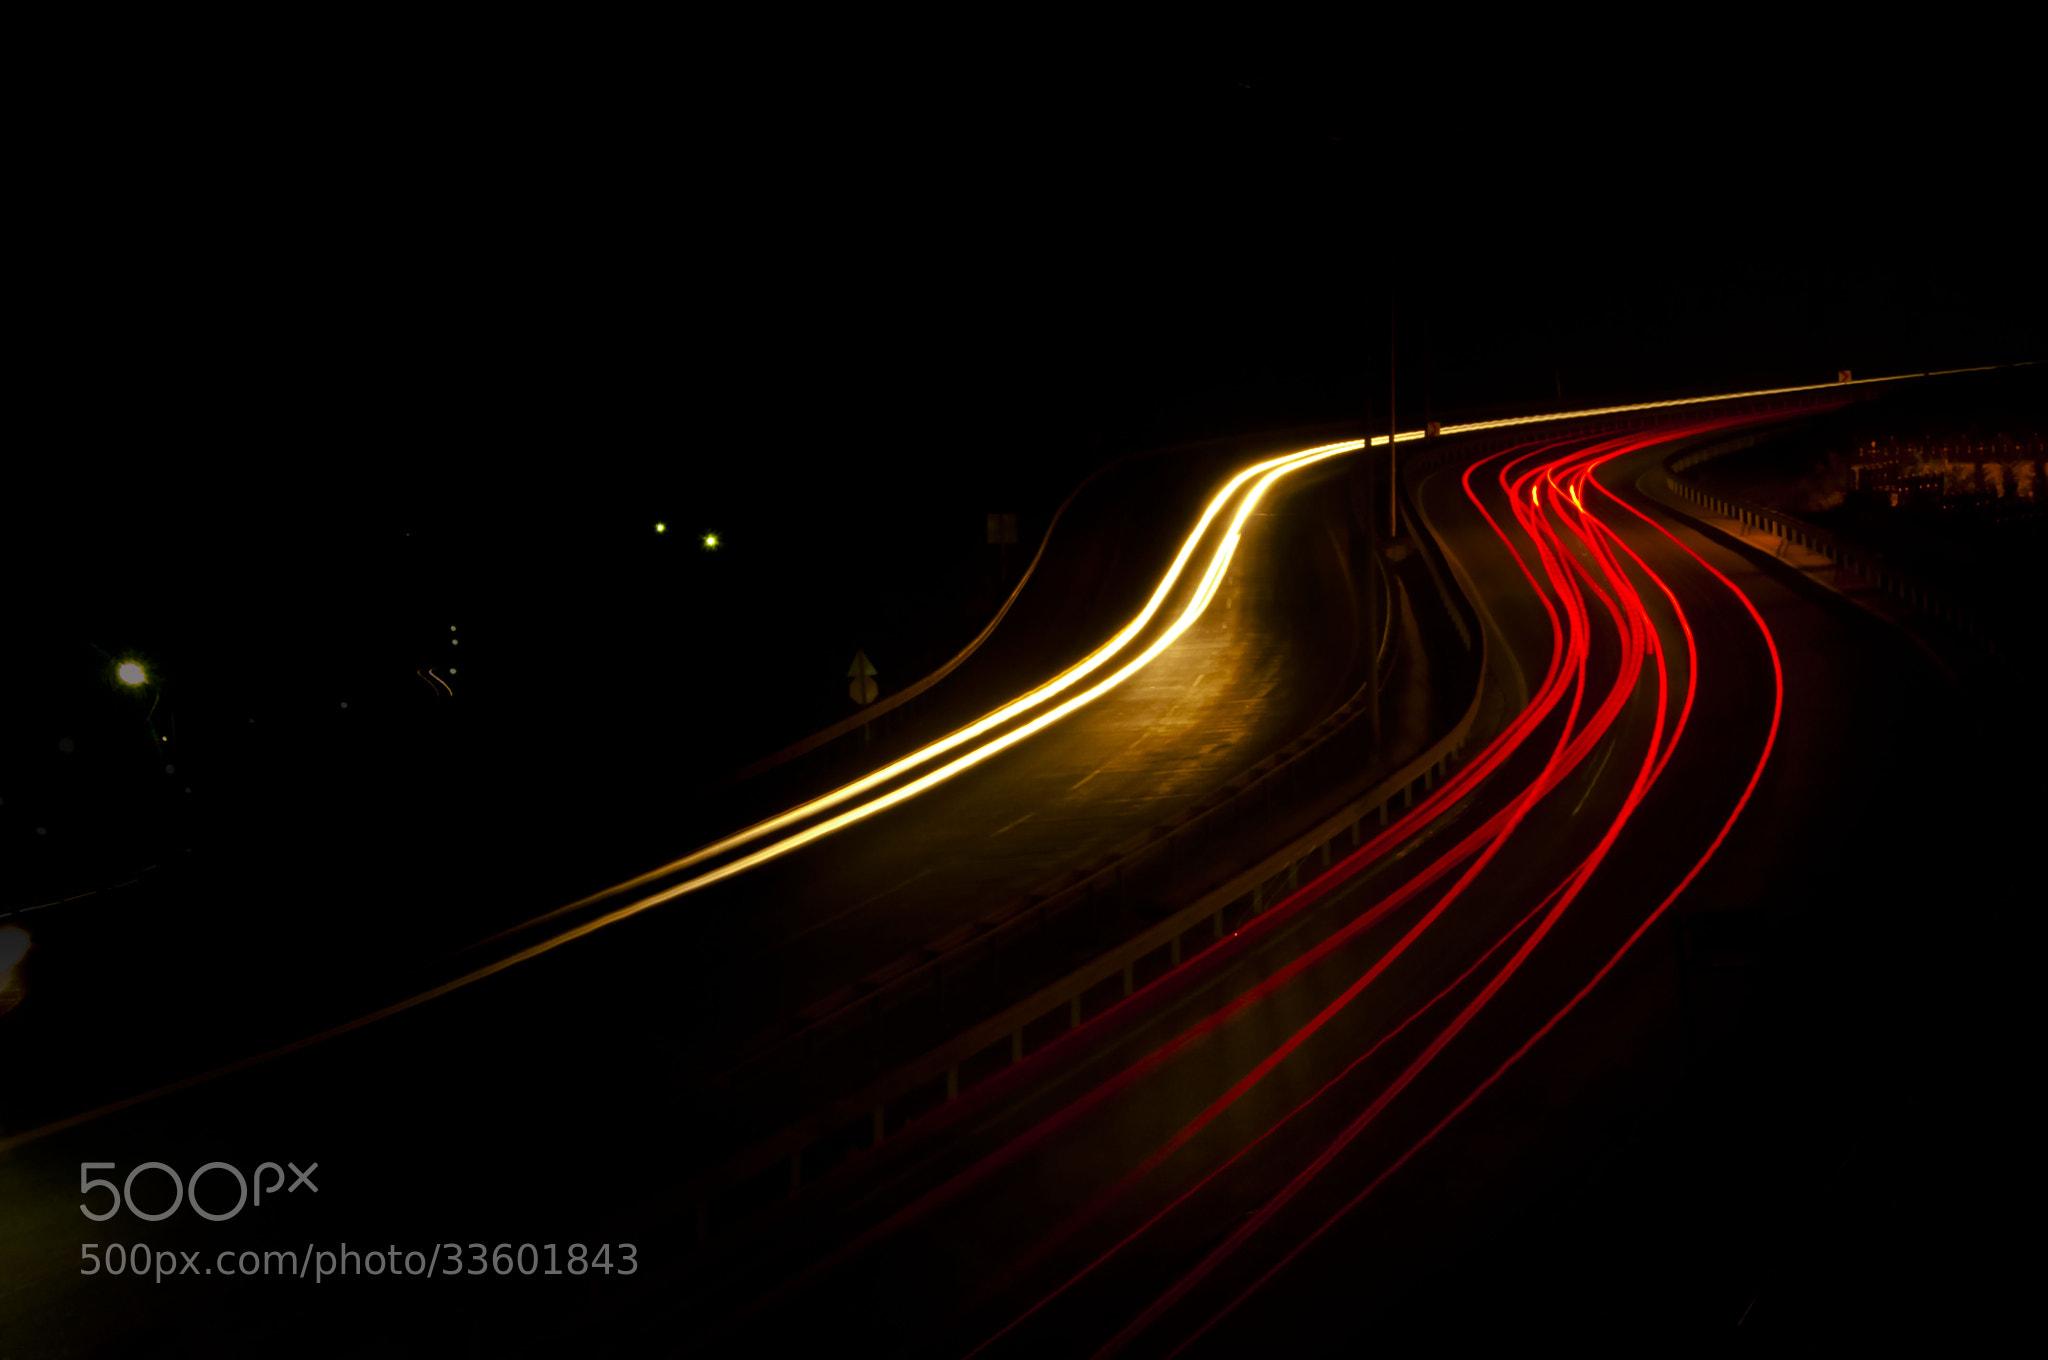 Photograph Light Way by Melih Gün on 500px